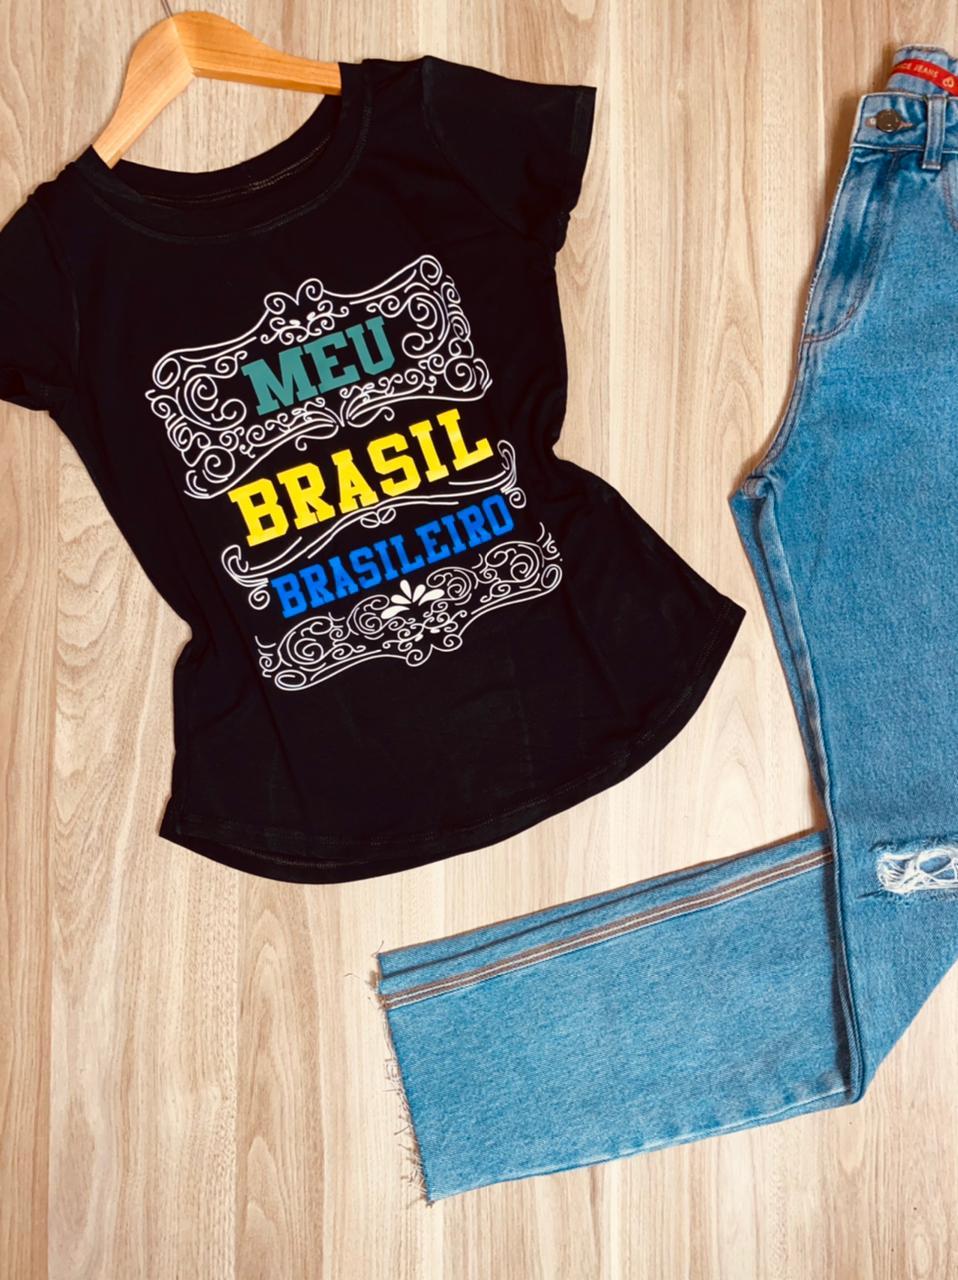 T-shirt Meu Brasil Brasileiro